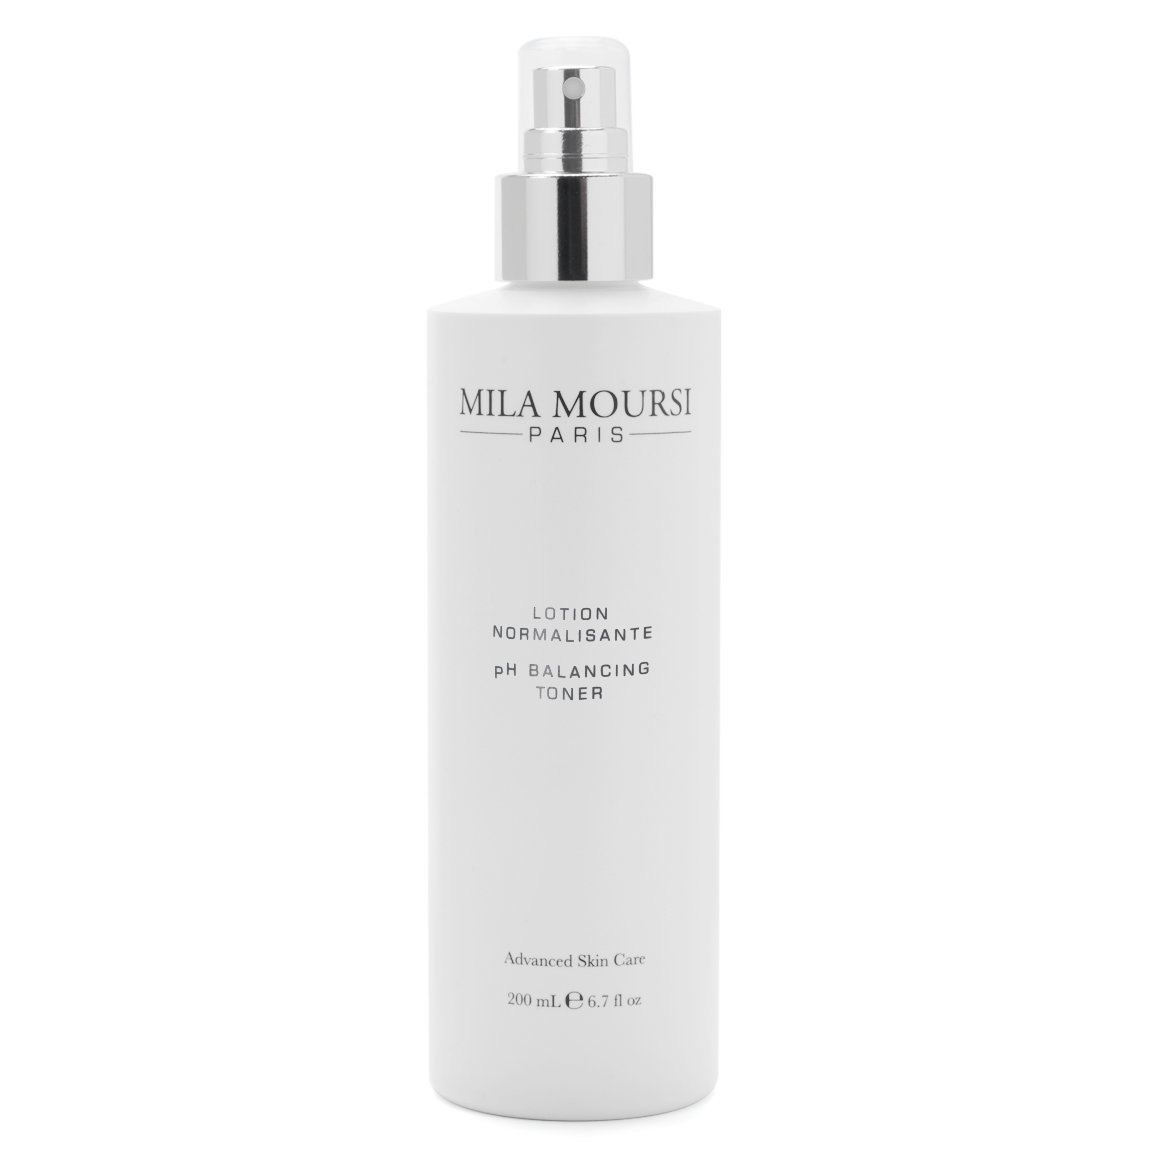 Mila Moursi pH Balancing Toner 200 ml product swatch.